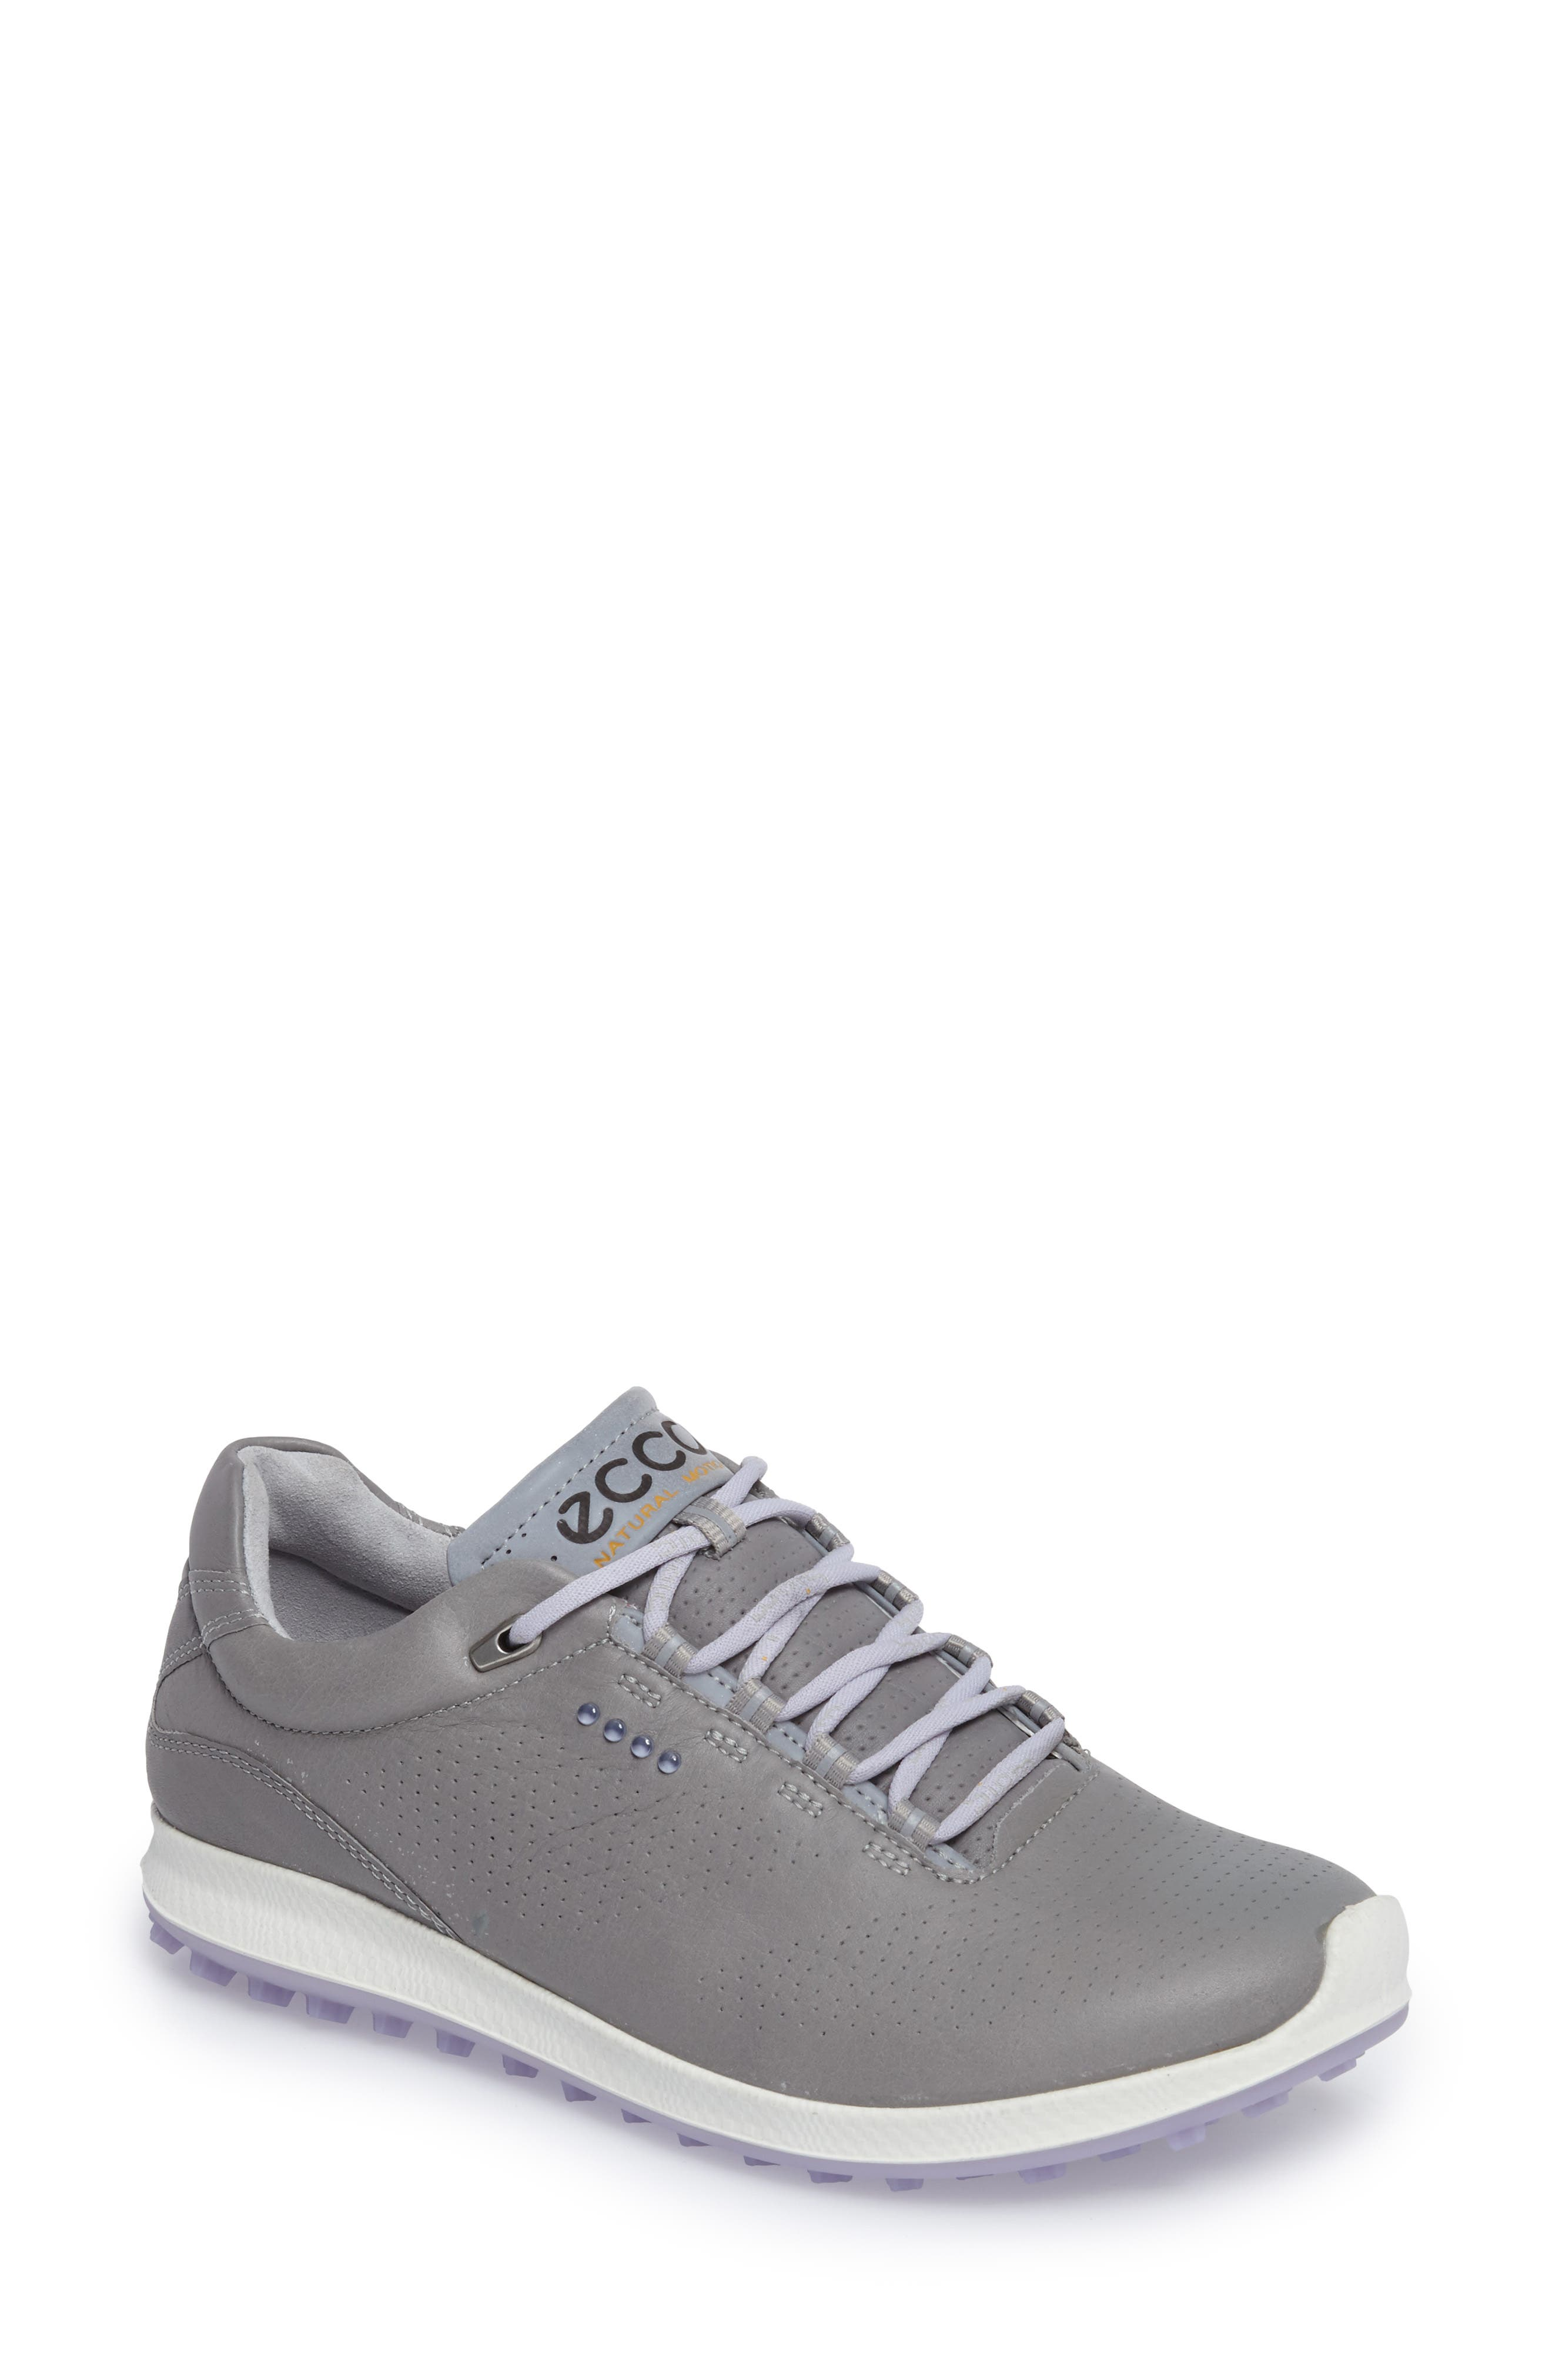 ECCO BIOM 2 Hybrid Water-Repellent Golf Shoe (Women)